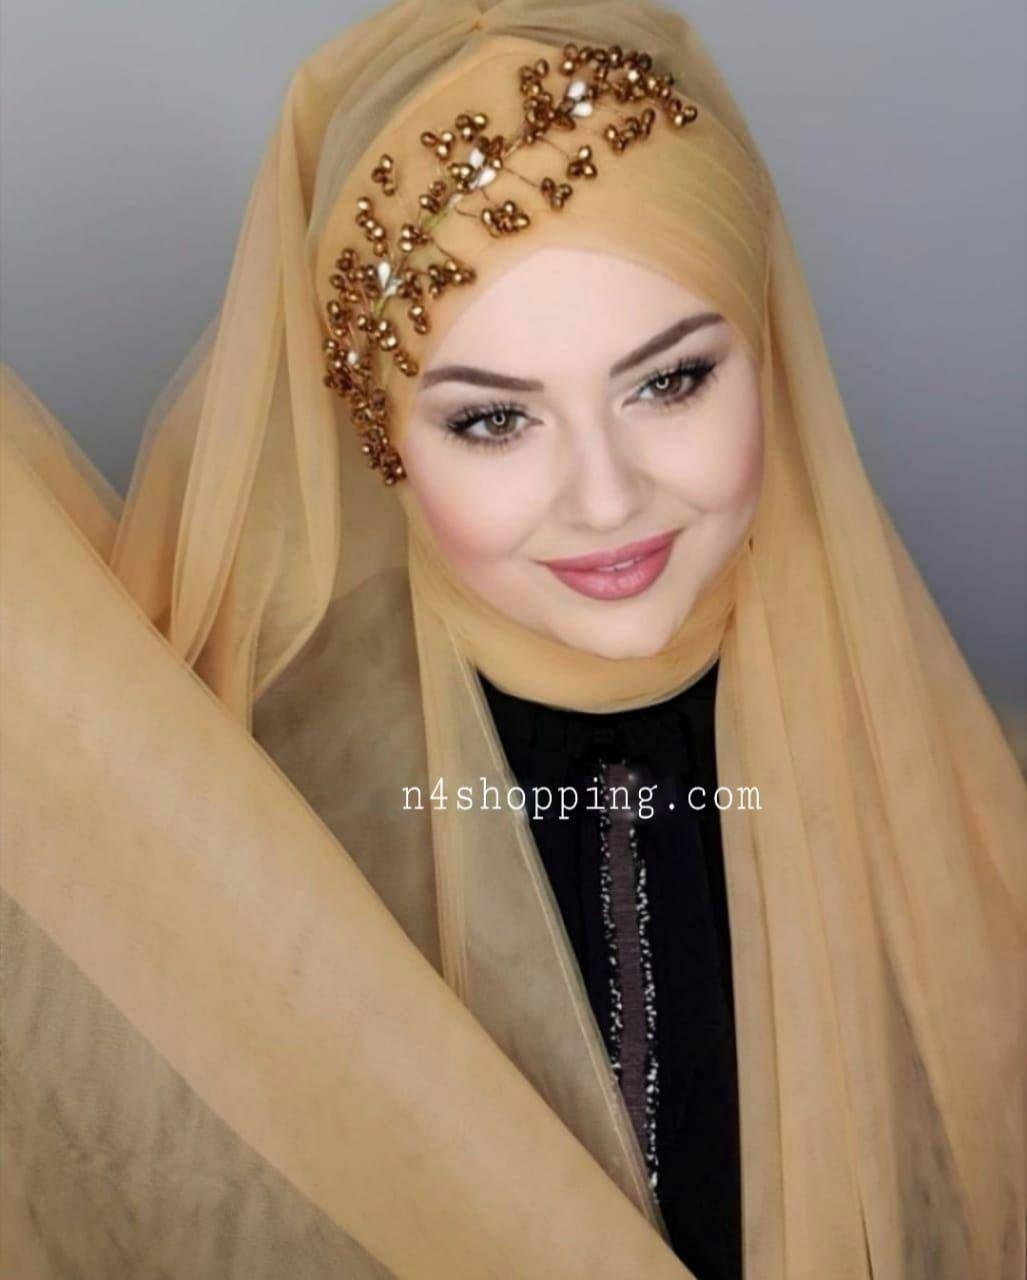 Hijab Headscarves Shawl Turban Turkishstyle Bonnet Hijabtutorial Modanisa Differenaz Tulipatu Hijab Fashion Modest Fashion Hijab Hijab Style Tutorial